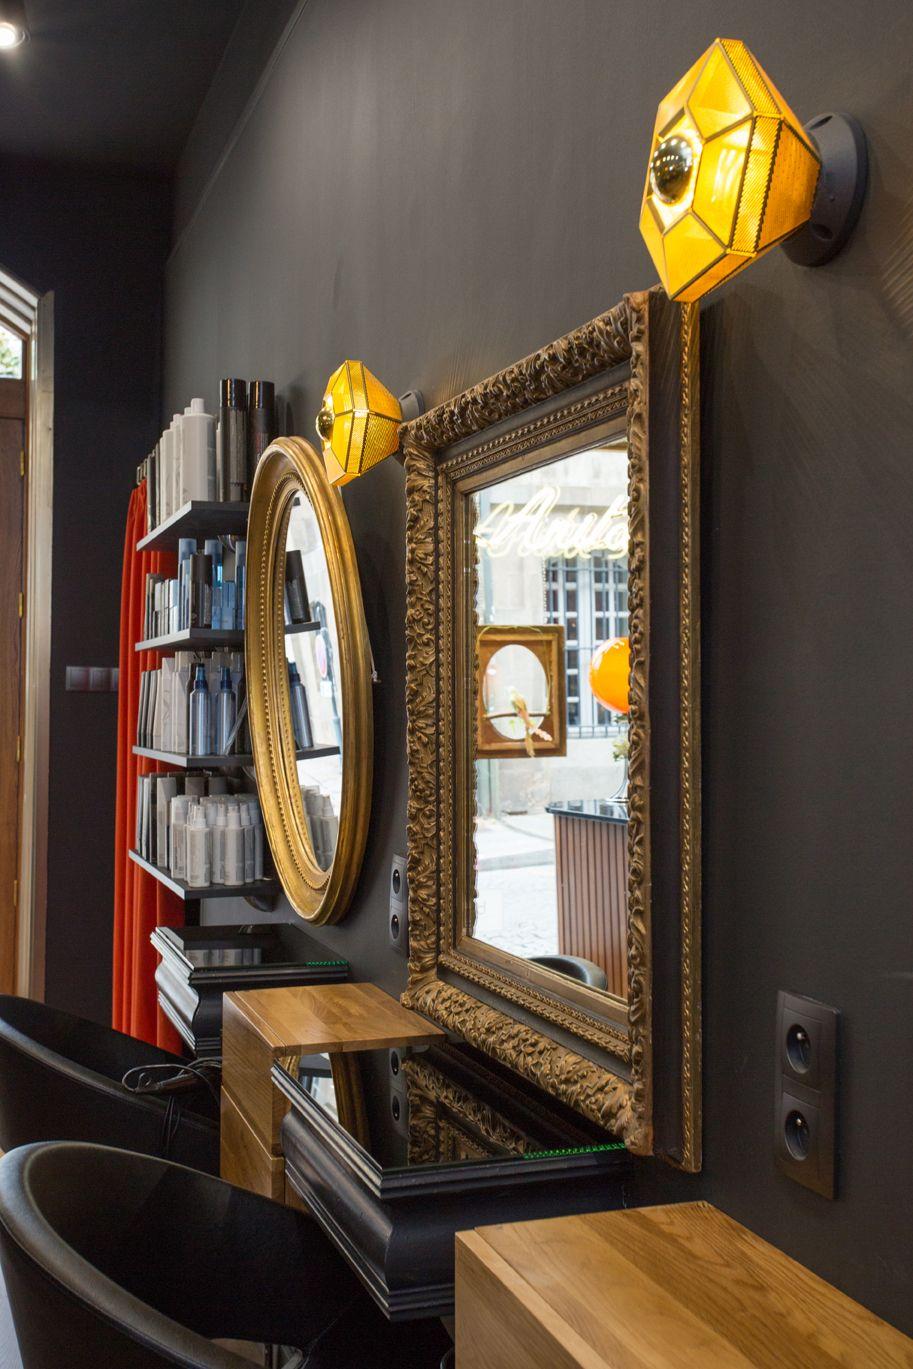 Le Salon De Coiffure Anita P A Rennes Agence 19 Degres Par